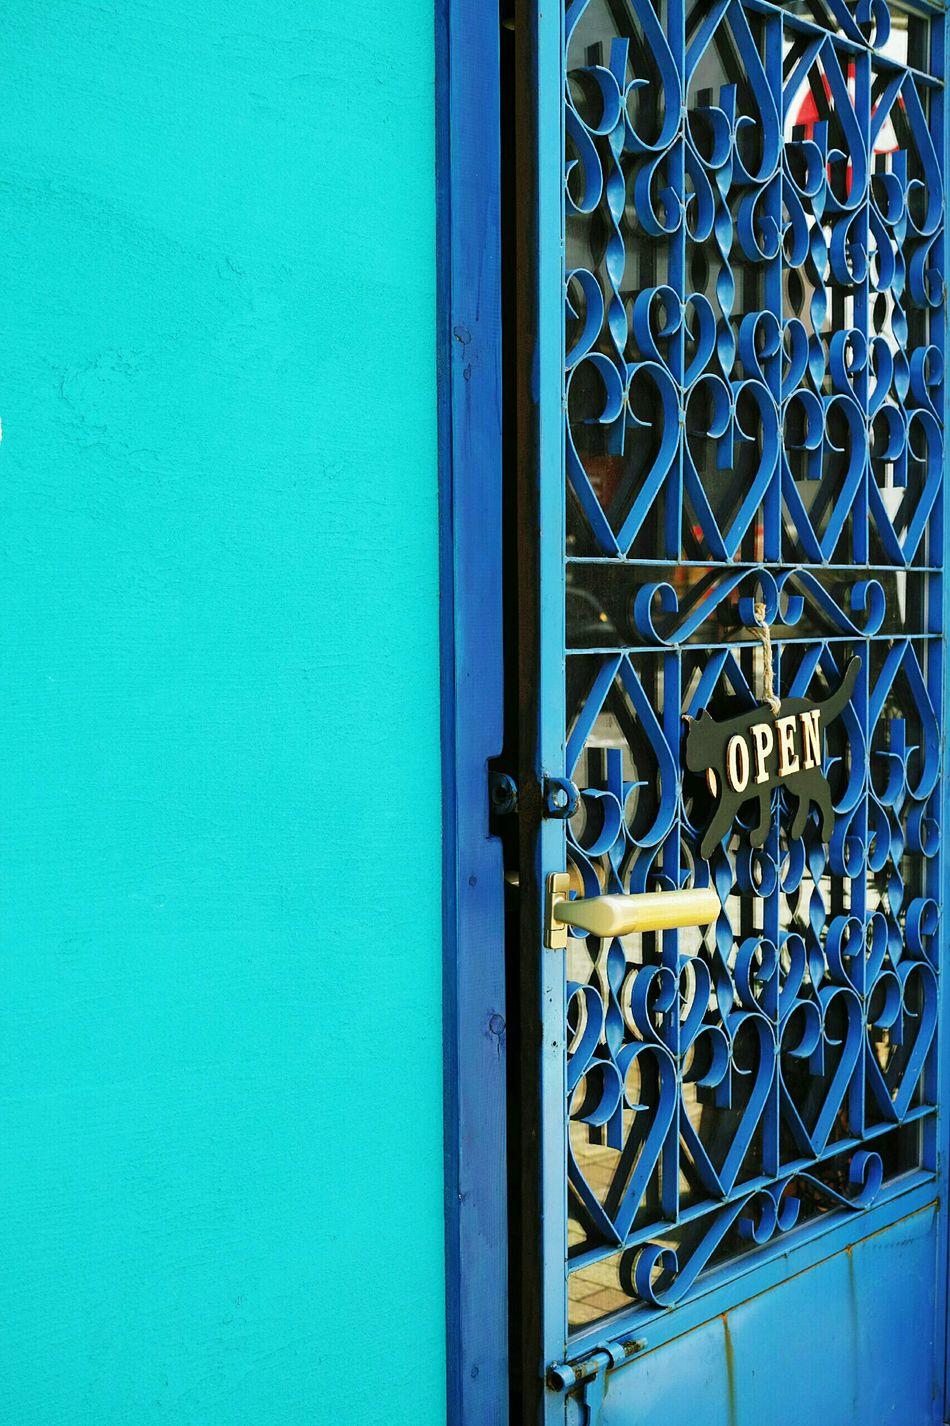 Showcase June Door Blue Turquoise By Motorola Turquoise Doorporn Doors Lover Interior Design Architectural Detail Streetphotography Streetphoto_color Street Photography Getting Inspired EyeEm Gallery Open Edit